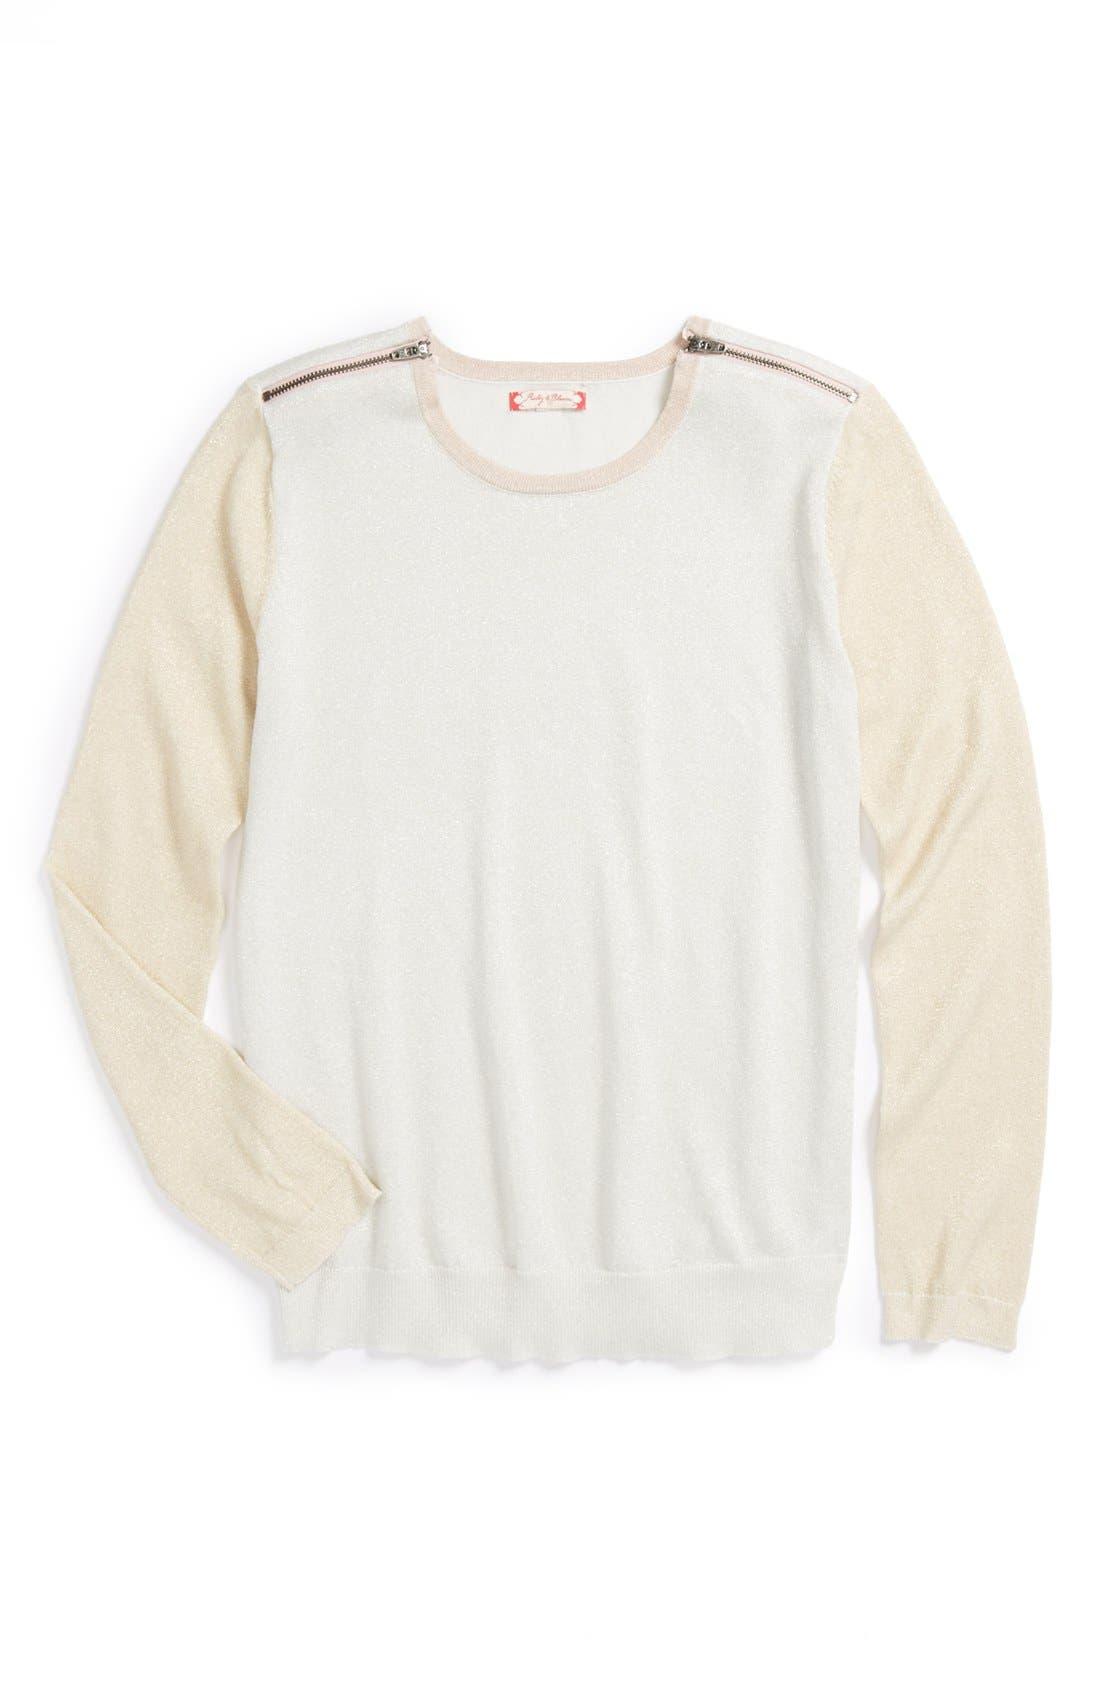 Main Image - Ruby & Bloom 'Glitzy' Sweater (Big Girls)